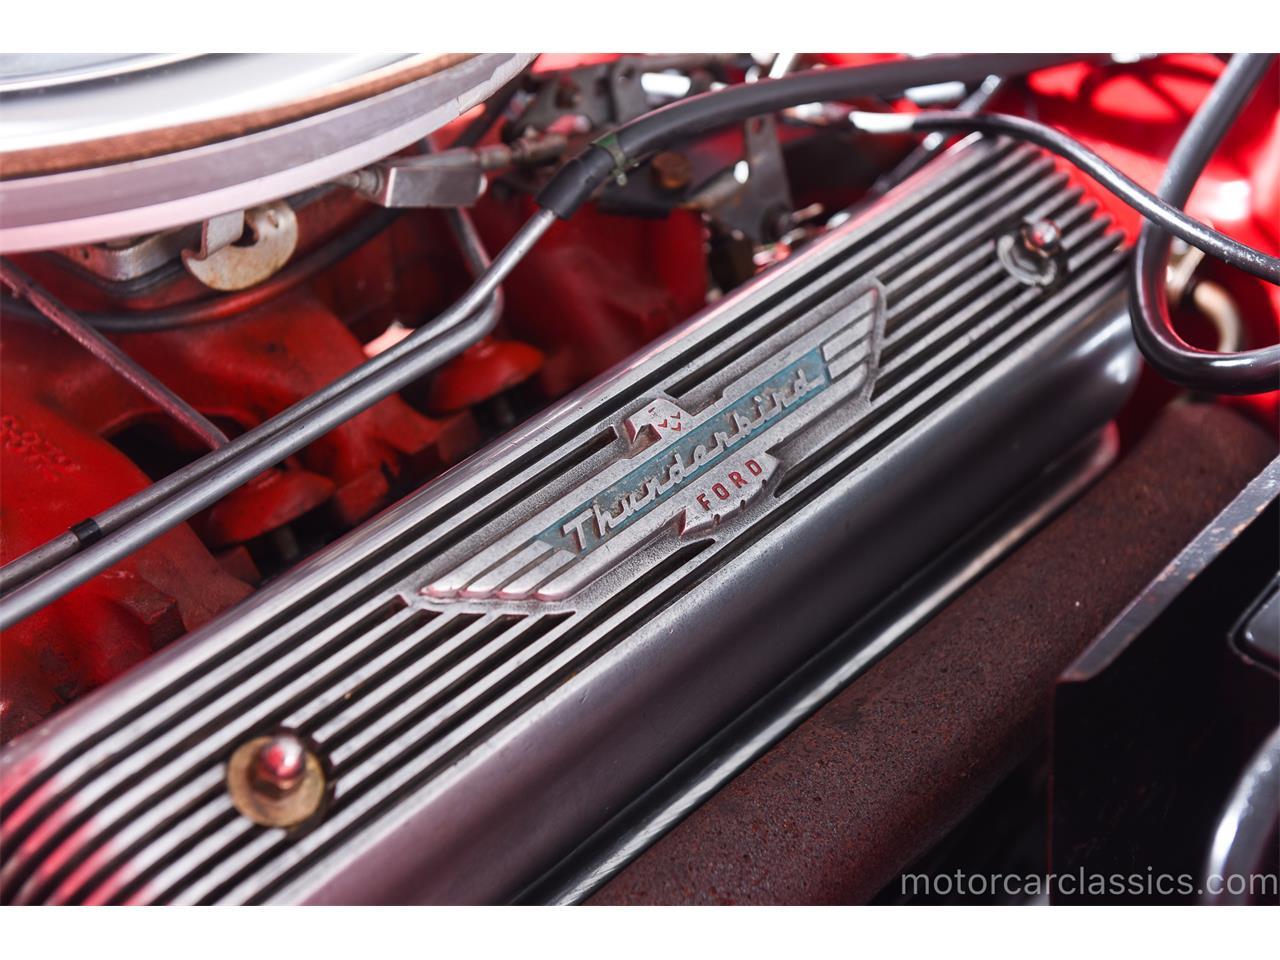 1955 Ford Thunderbird (CC-1376636) for sale in Farmingdale, New York